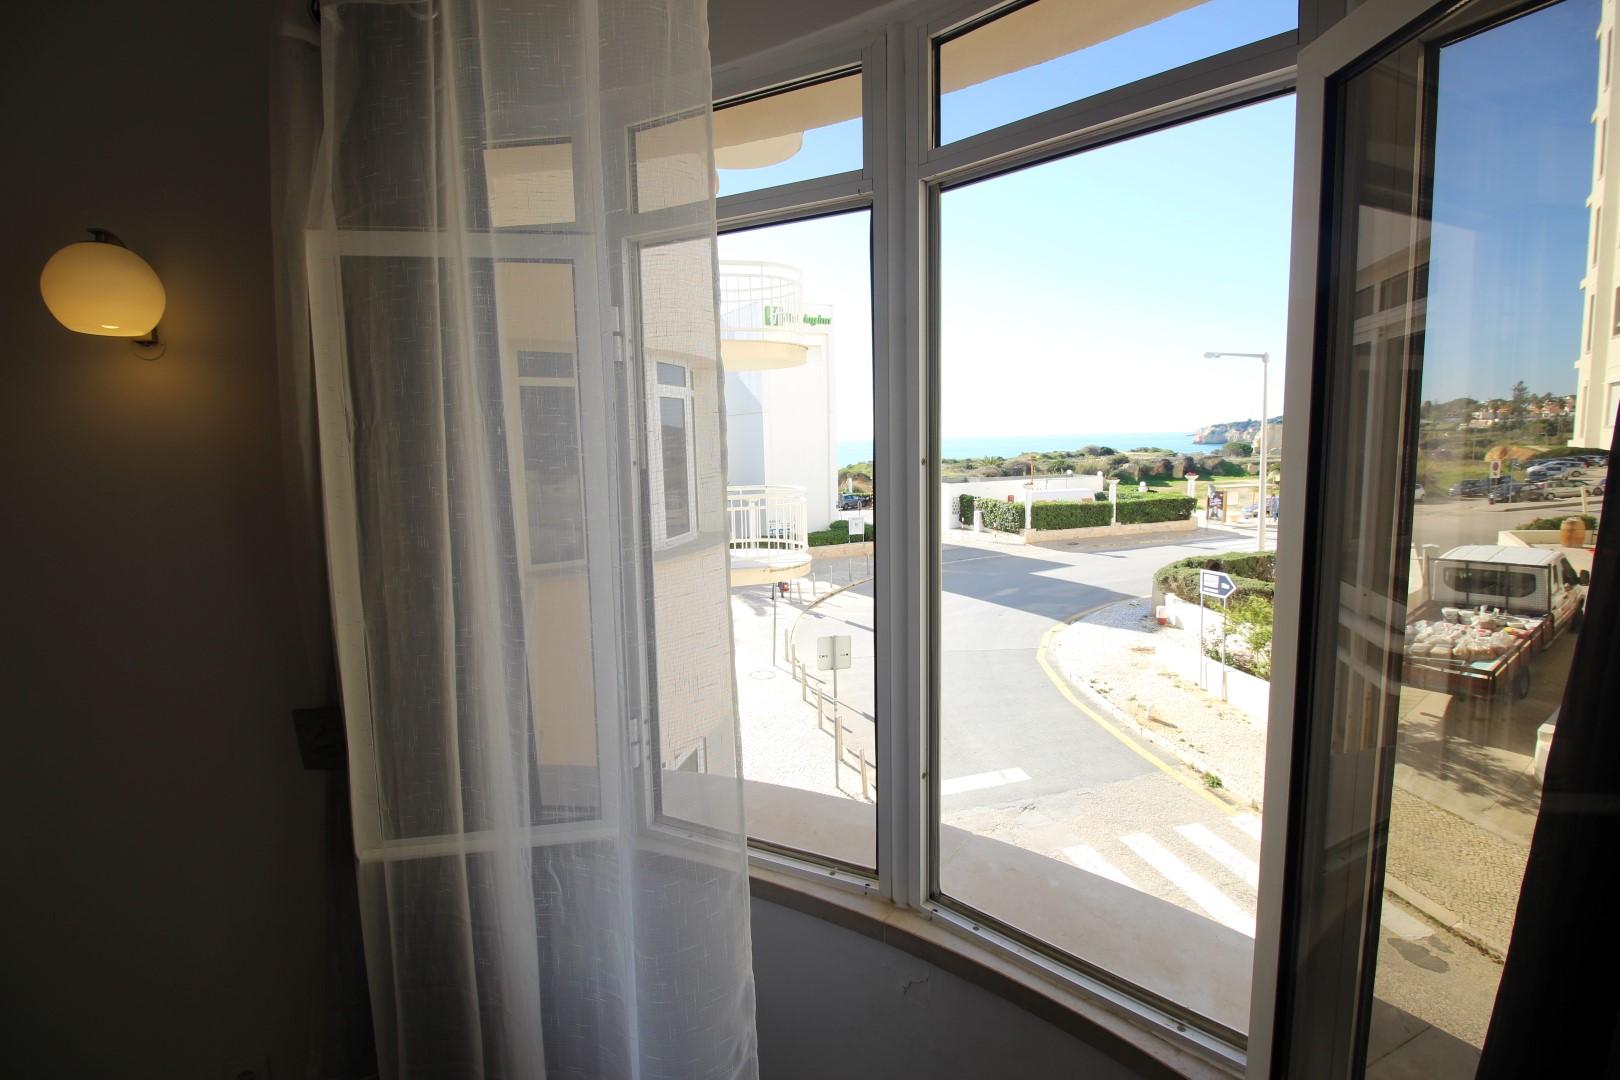 Location appartements et villas de vacance, Appartement en face de la plage – Armação-de-Pêra à Armação de Pêra, Portugal Algarve, REF_IMG_6809_8737